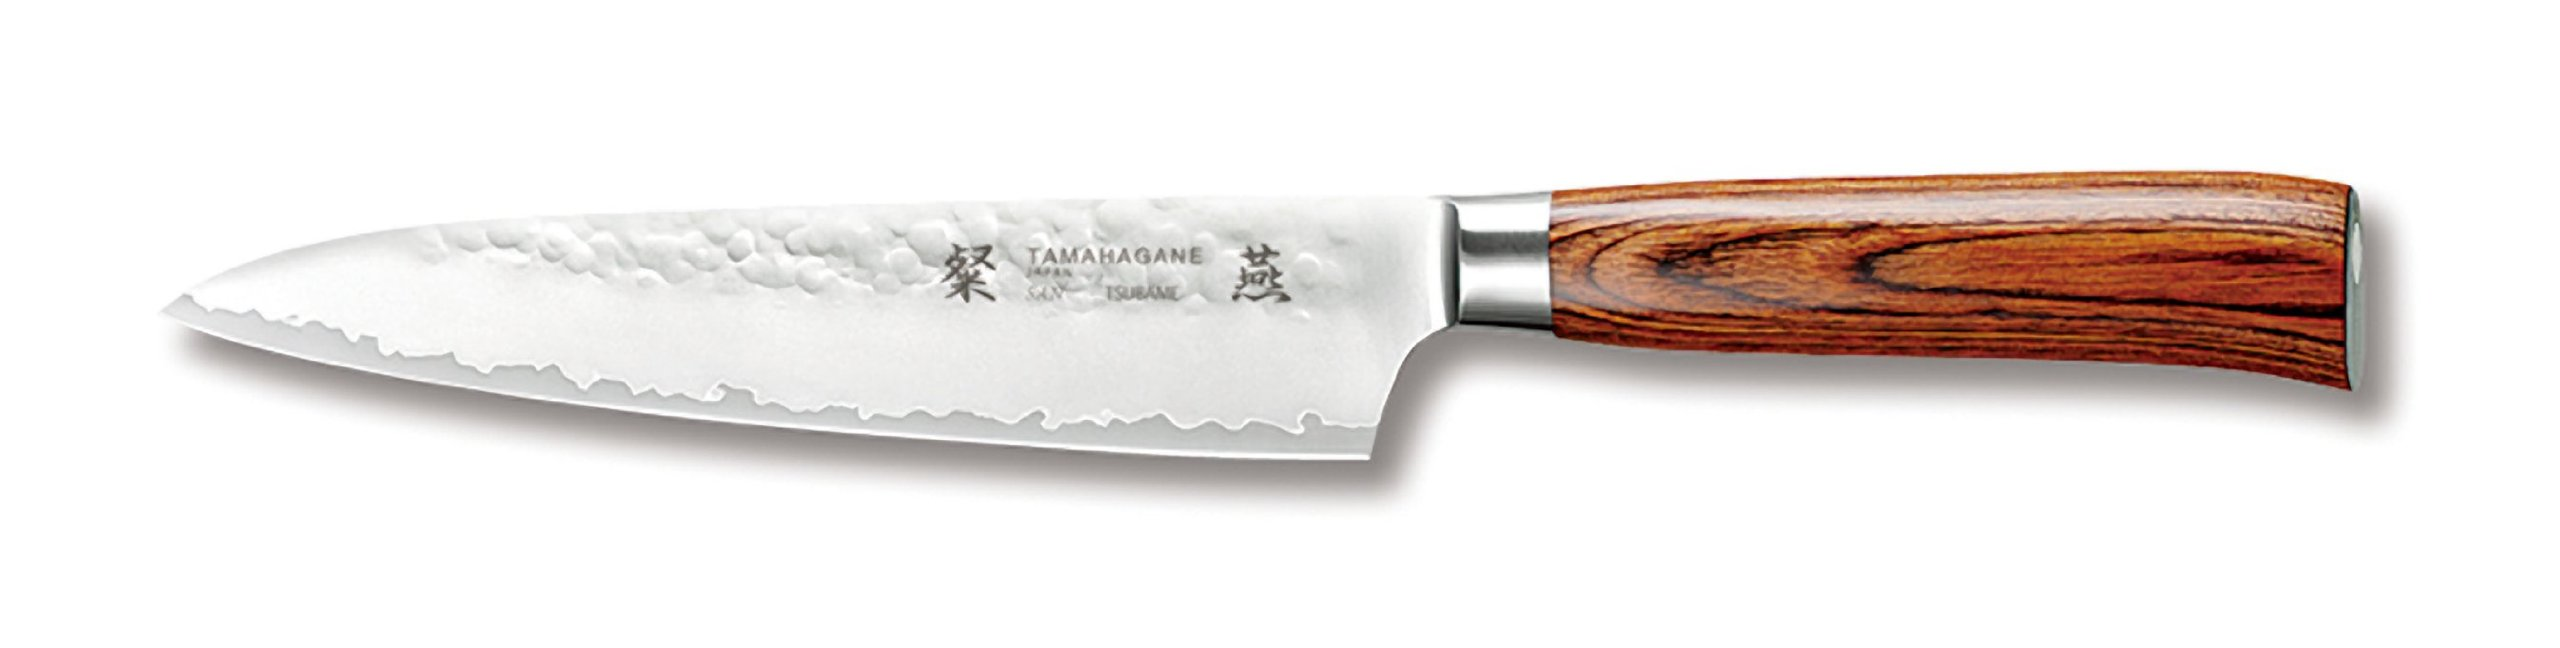 Tamahagane San Tsubame Wood SNH-1108 - 5 inch, 120mm Utility Knife